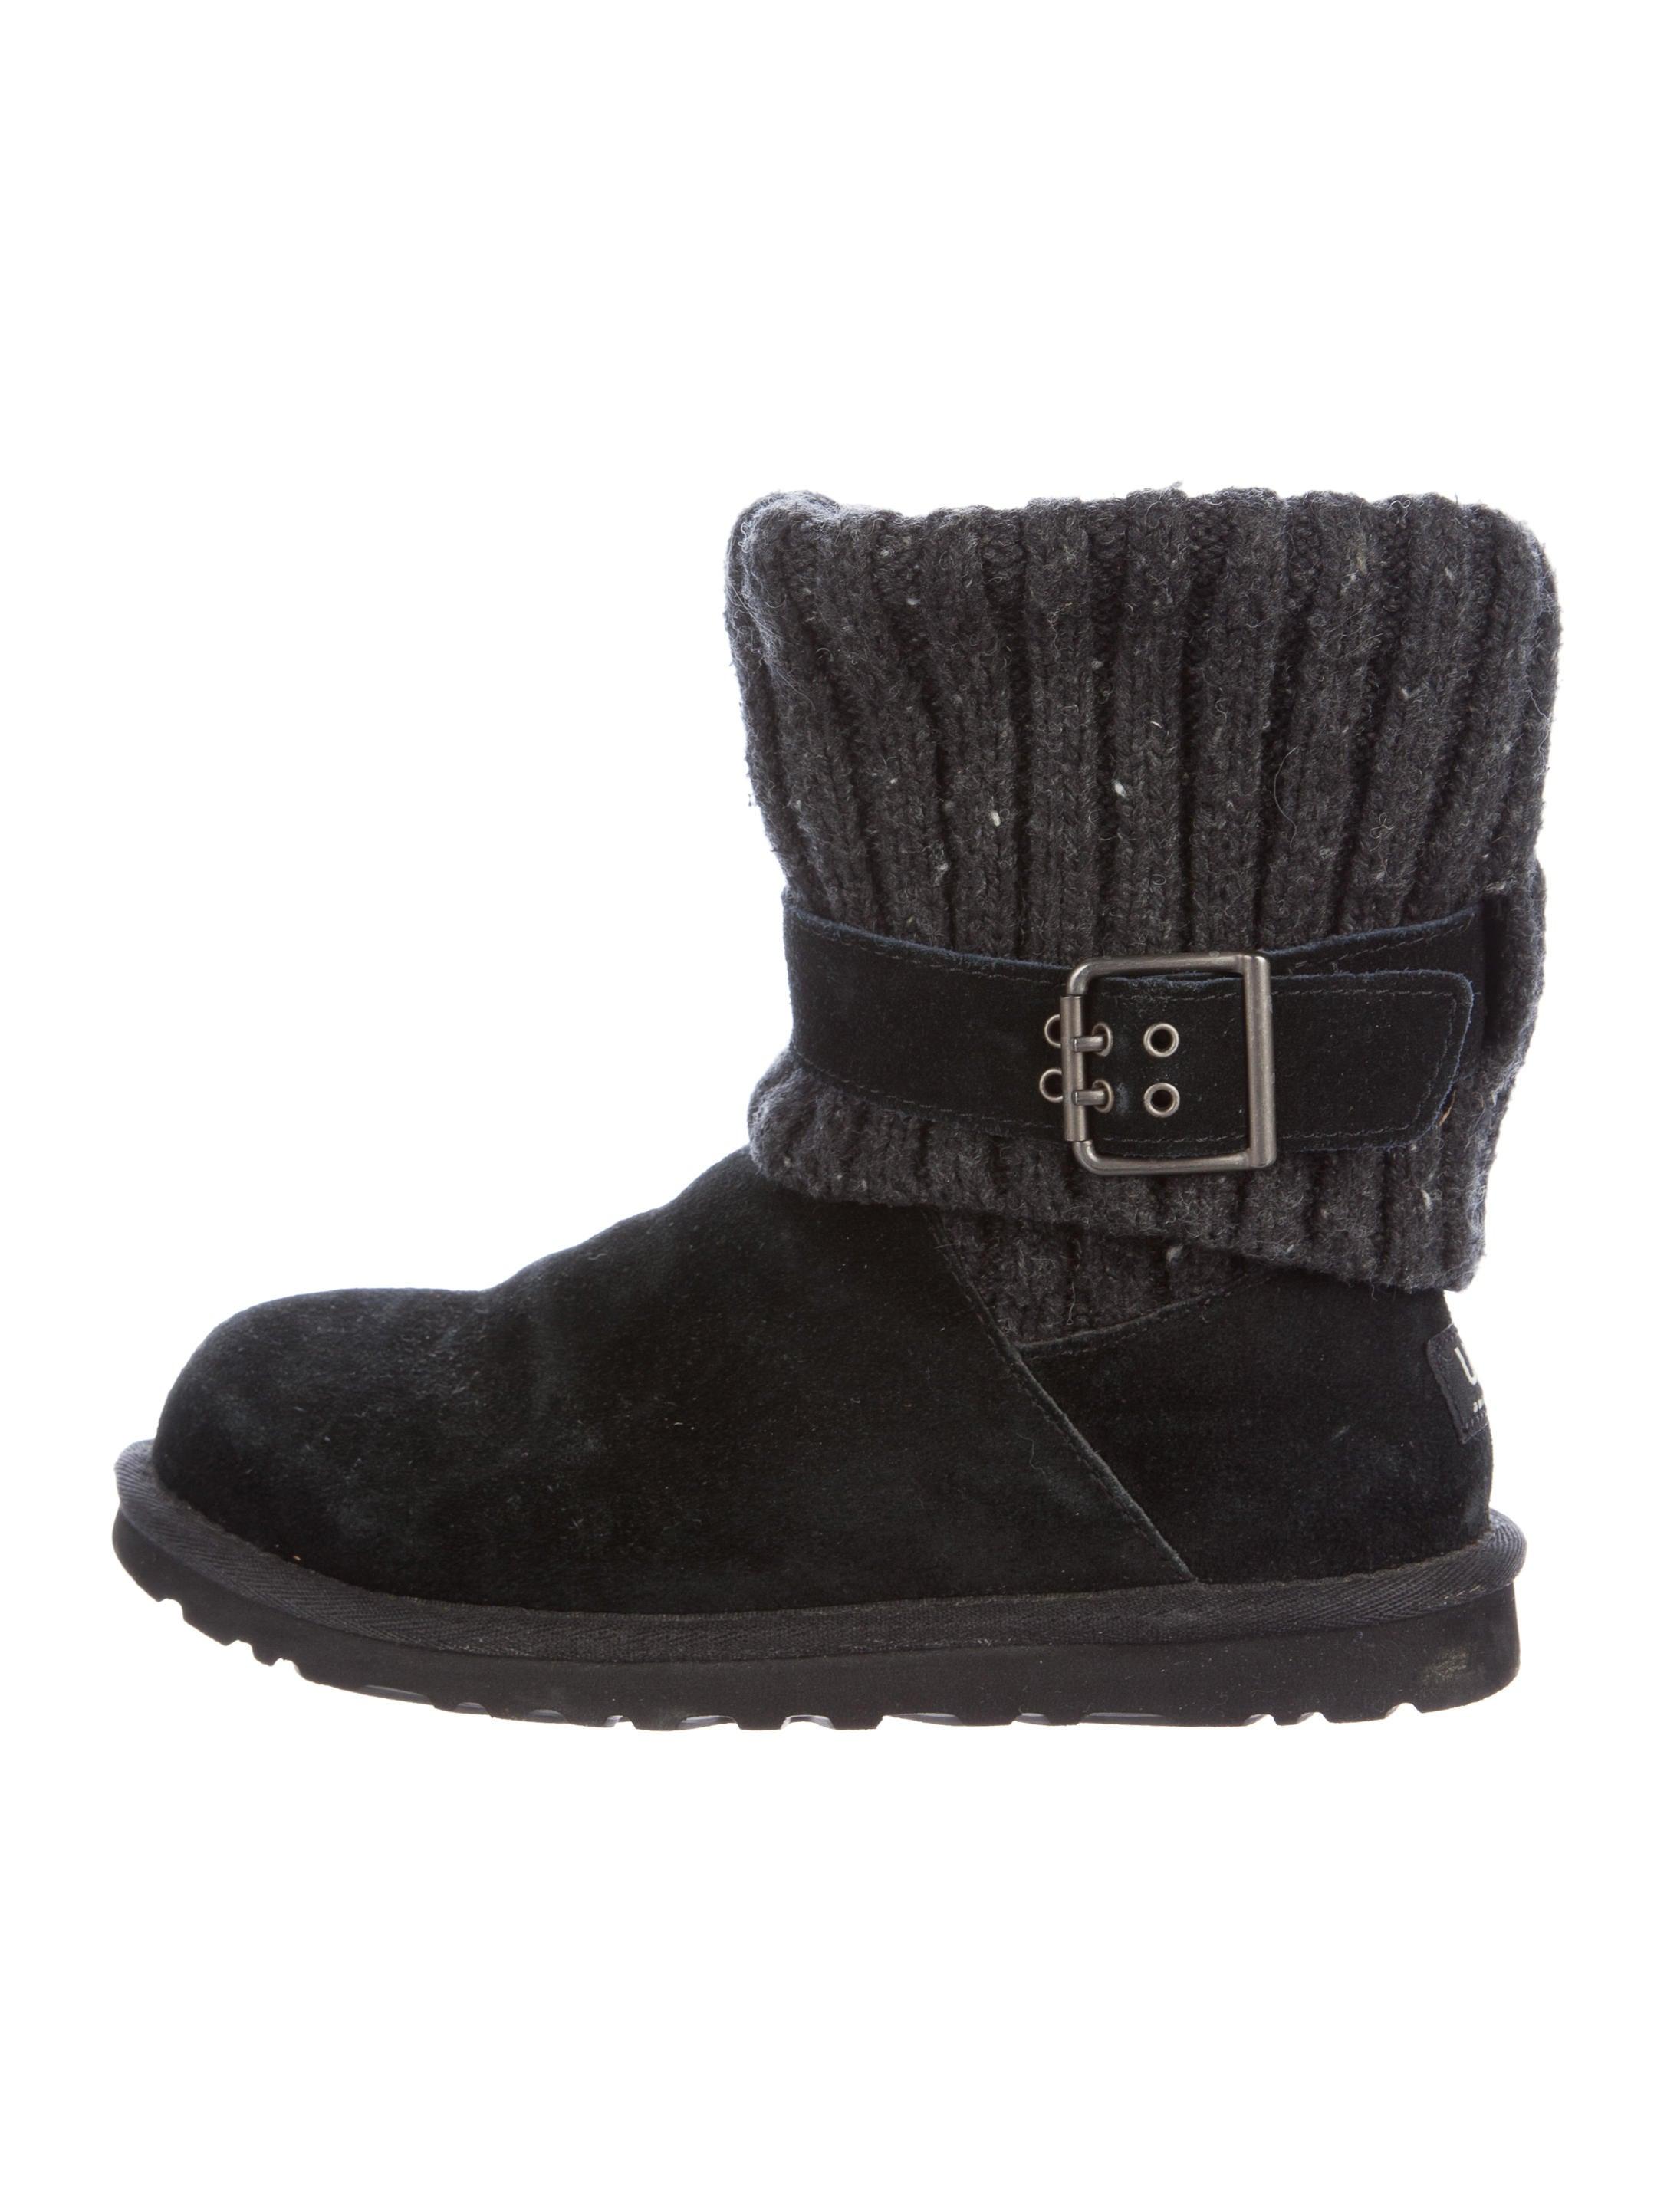 ugg australia cambridge knit ankle boots shoes